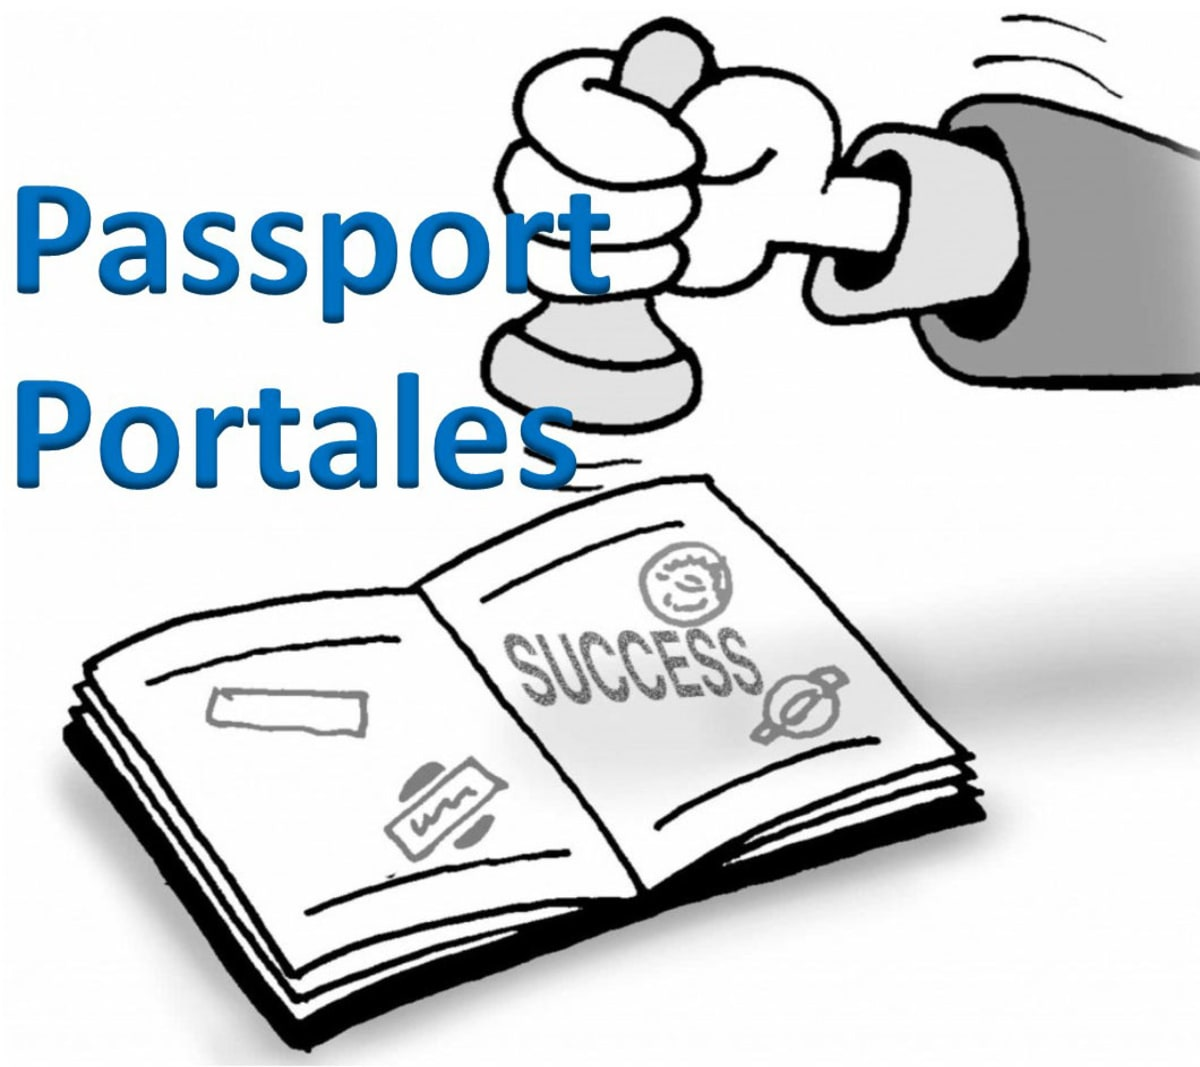 Passport-logo-w1200.jpg